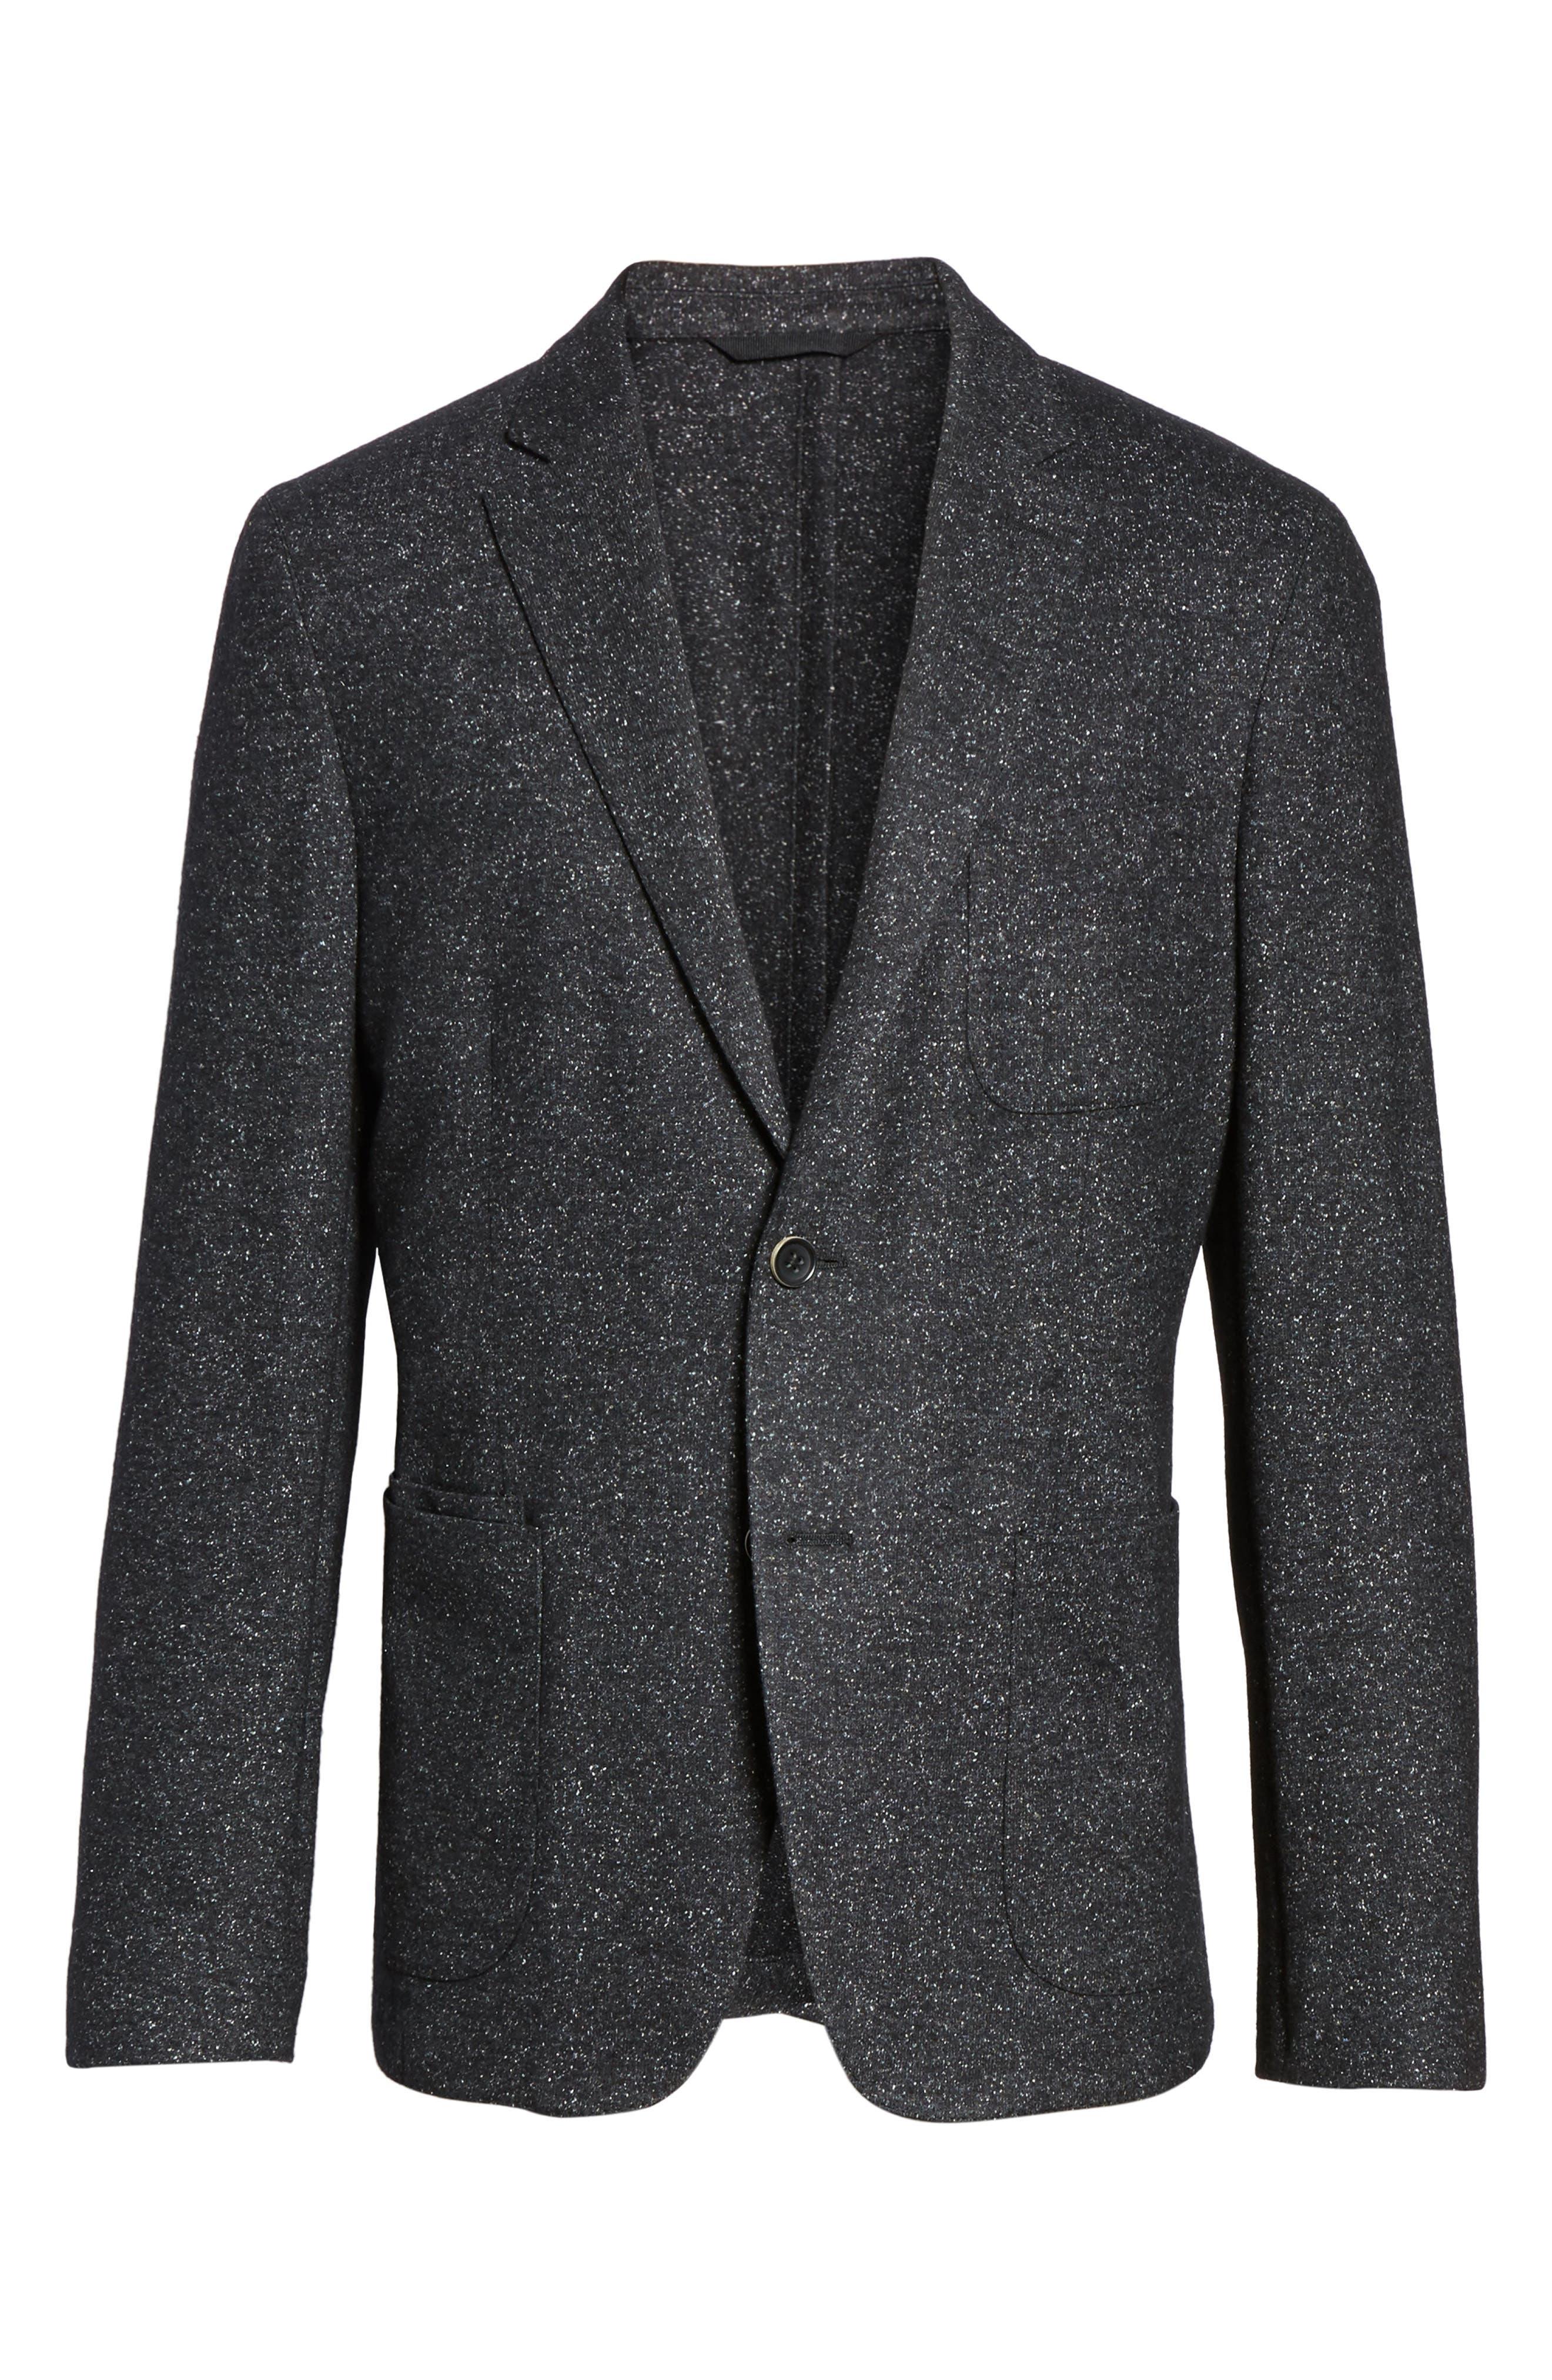 Donegal Classic Fit Suede Trim Jersey Sport Coat,                             Alternate thumbnail 5, color,                             021